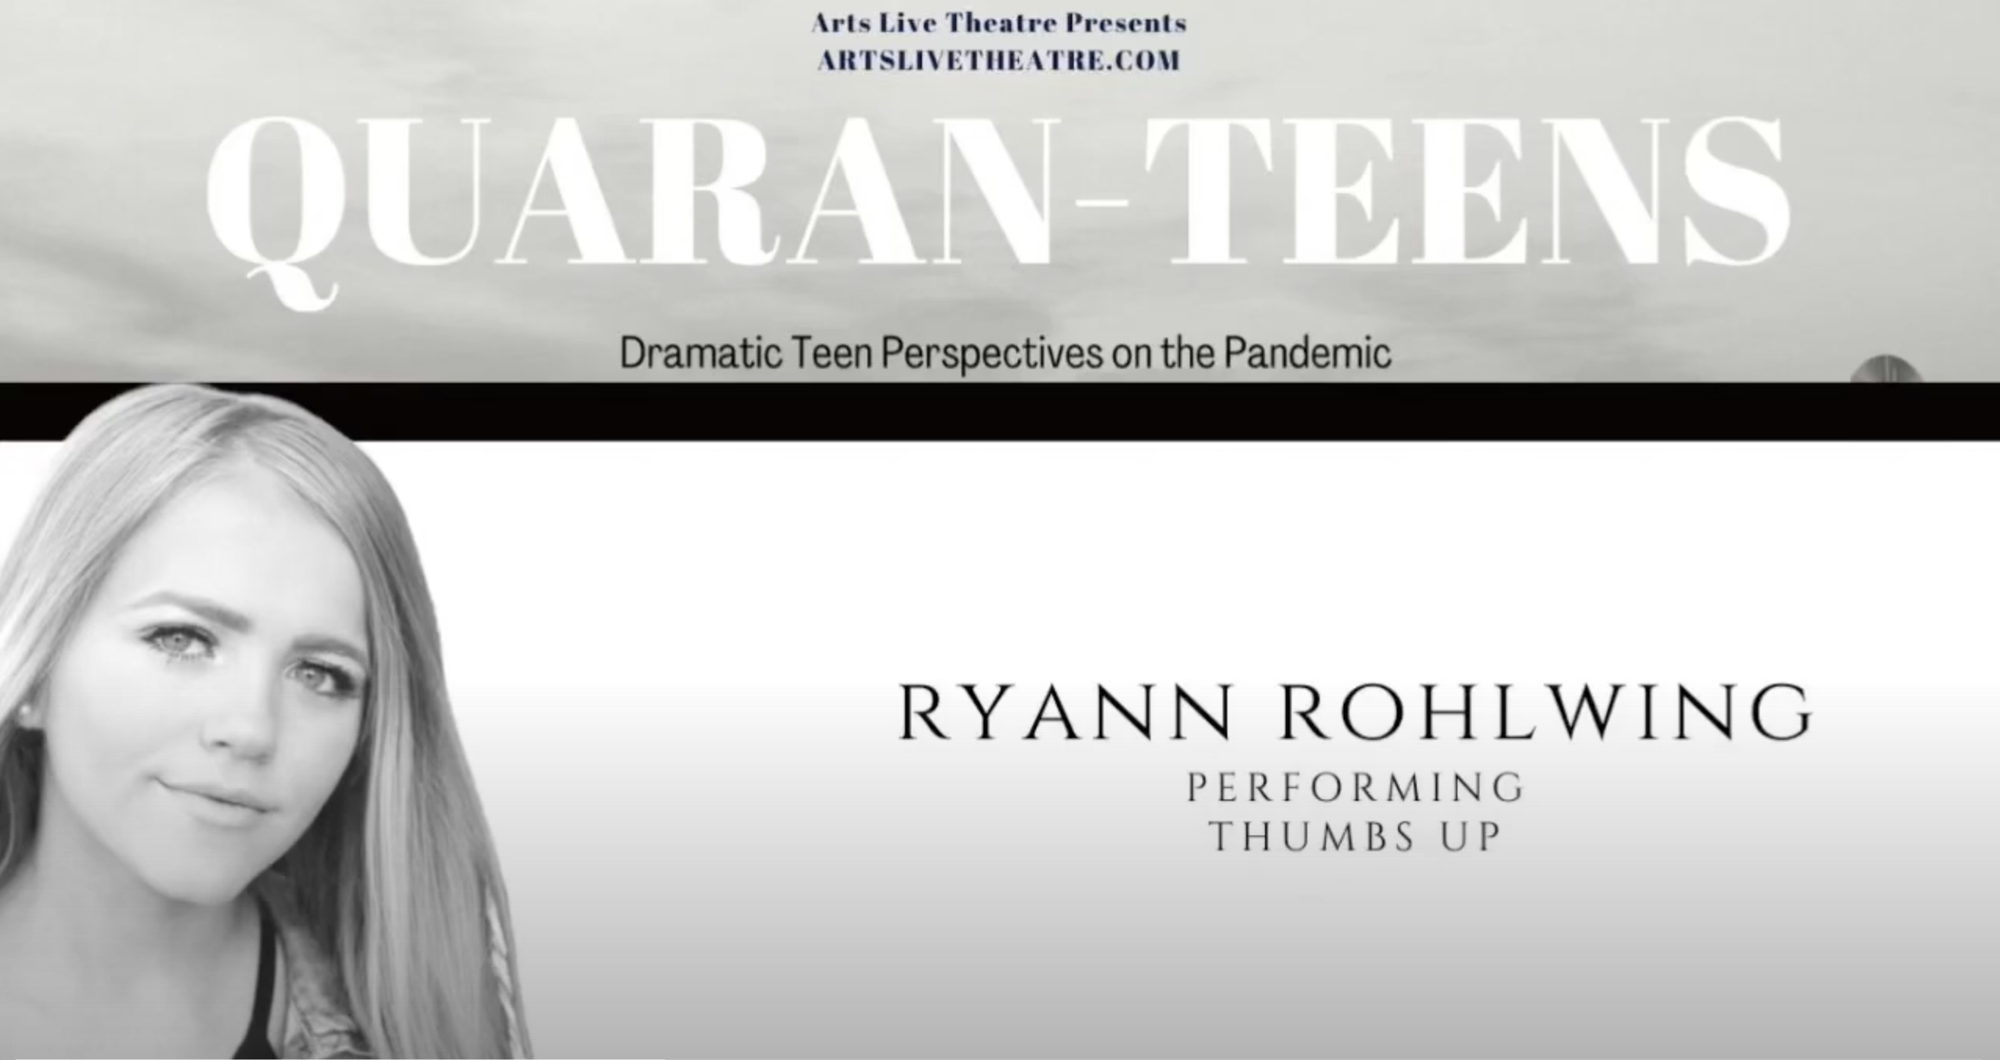 Quaran-Teens: Ryann Rohlwing performing Thumbs Up